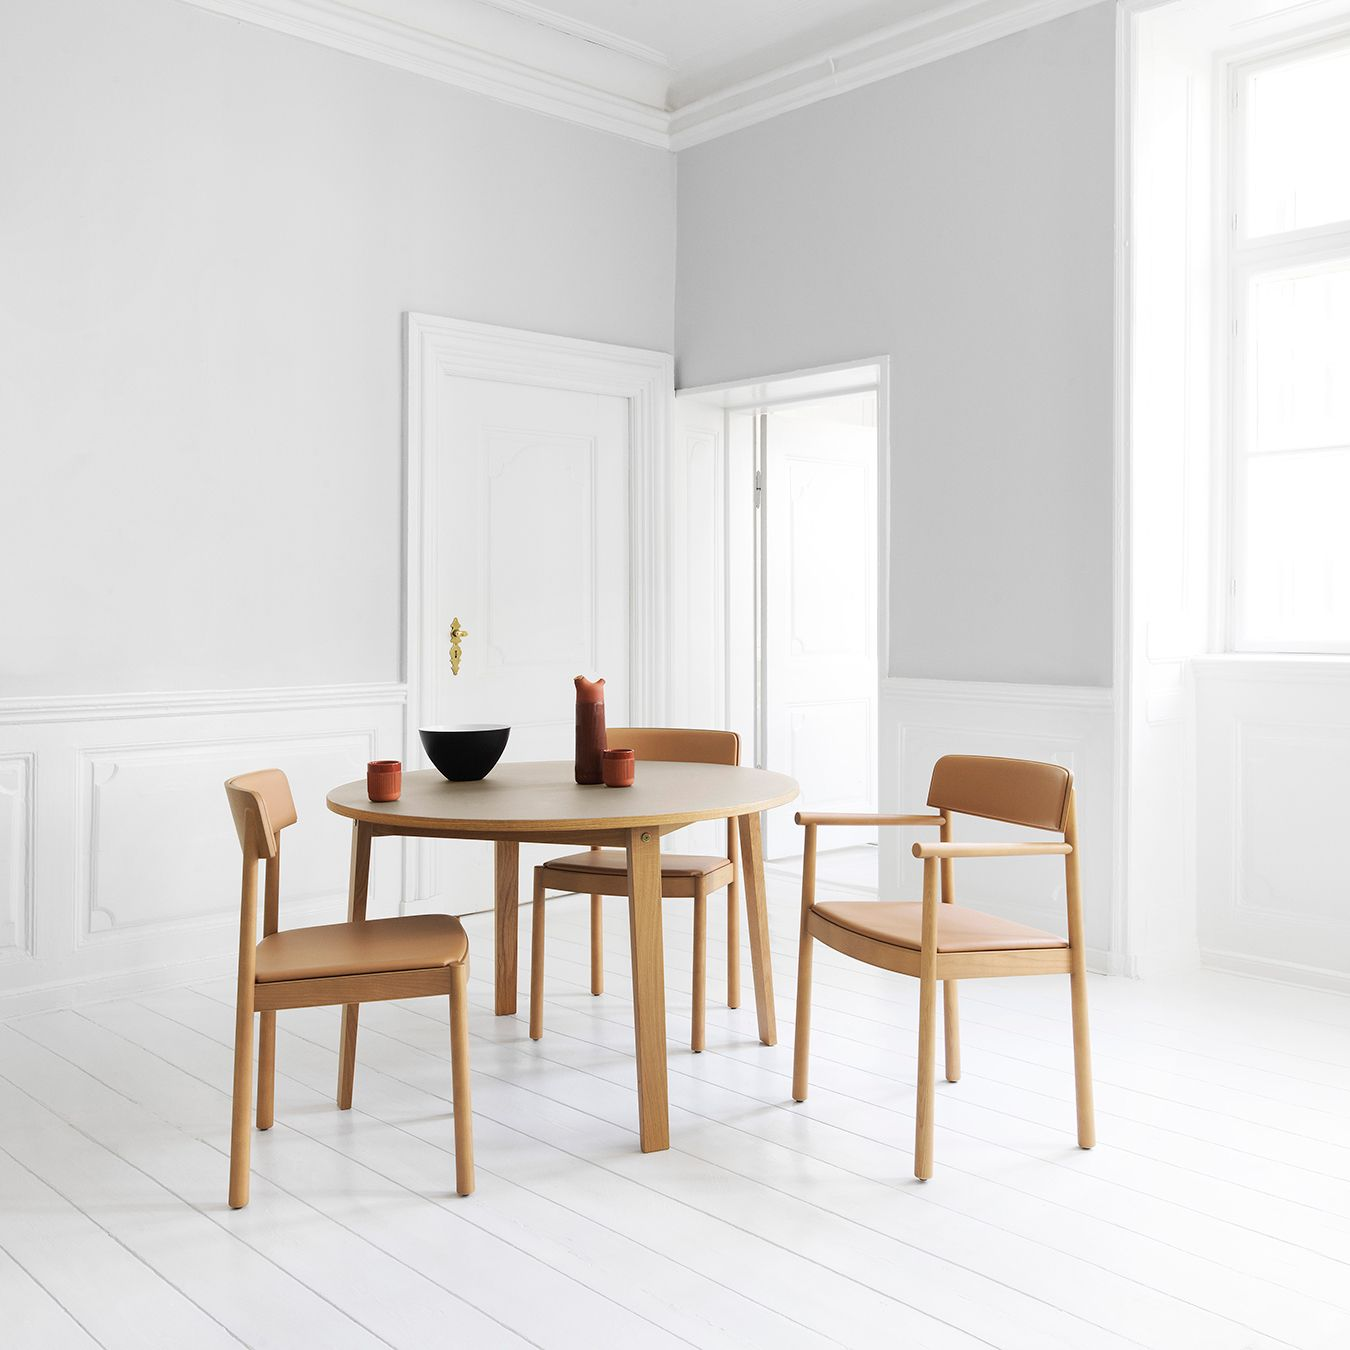 New Timb Chair In 2020 Scandinavian Furniture Design Furniture Design Scandinavian Design